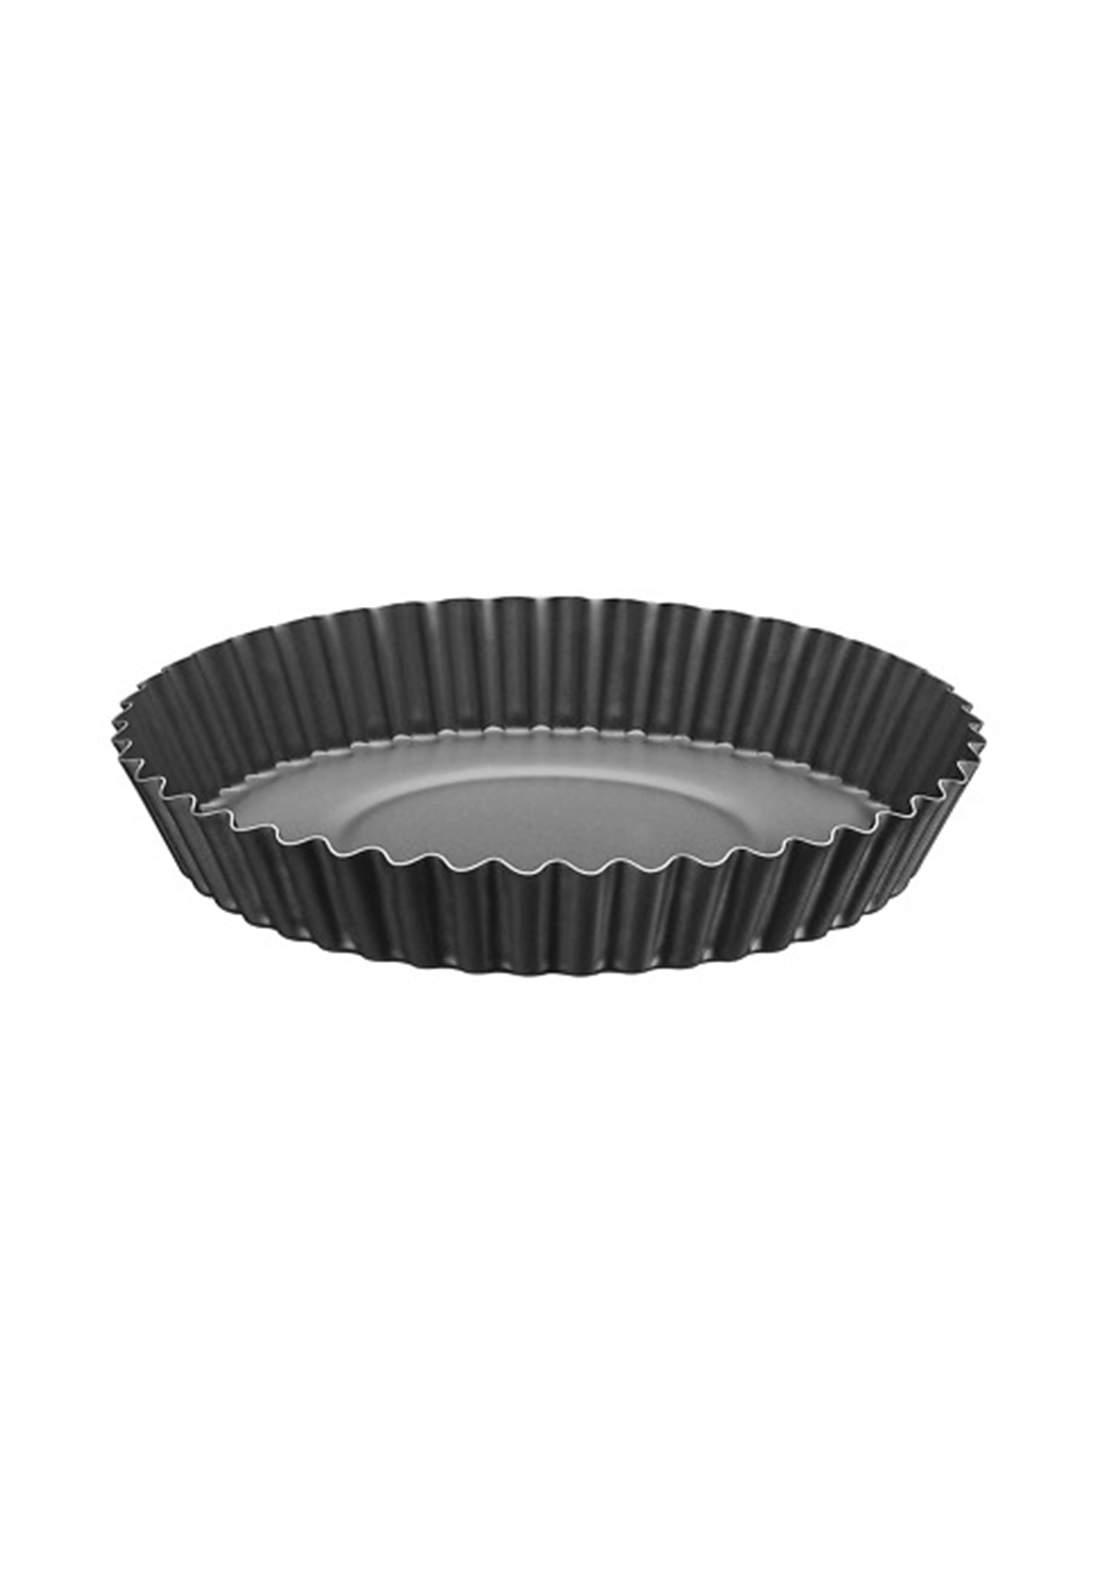 Tramontina '20056-022 Cake Mold Tin 22 cm Black  قالب كيك مقرنص